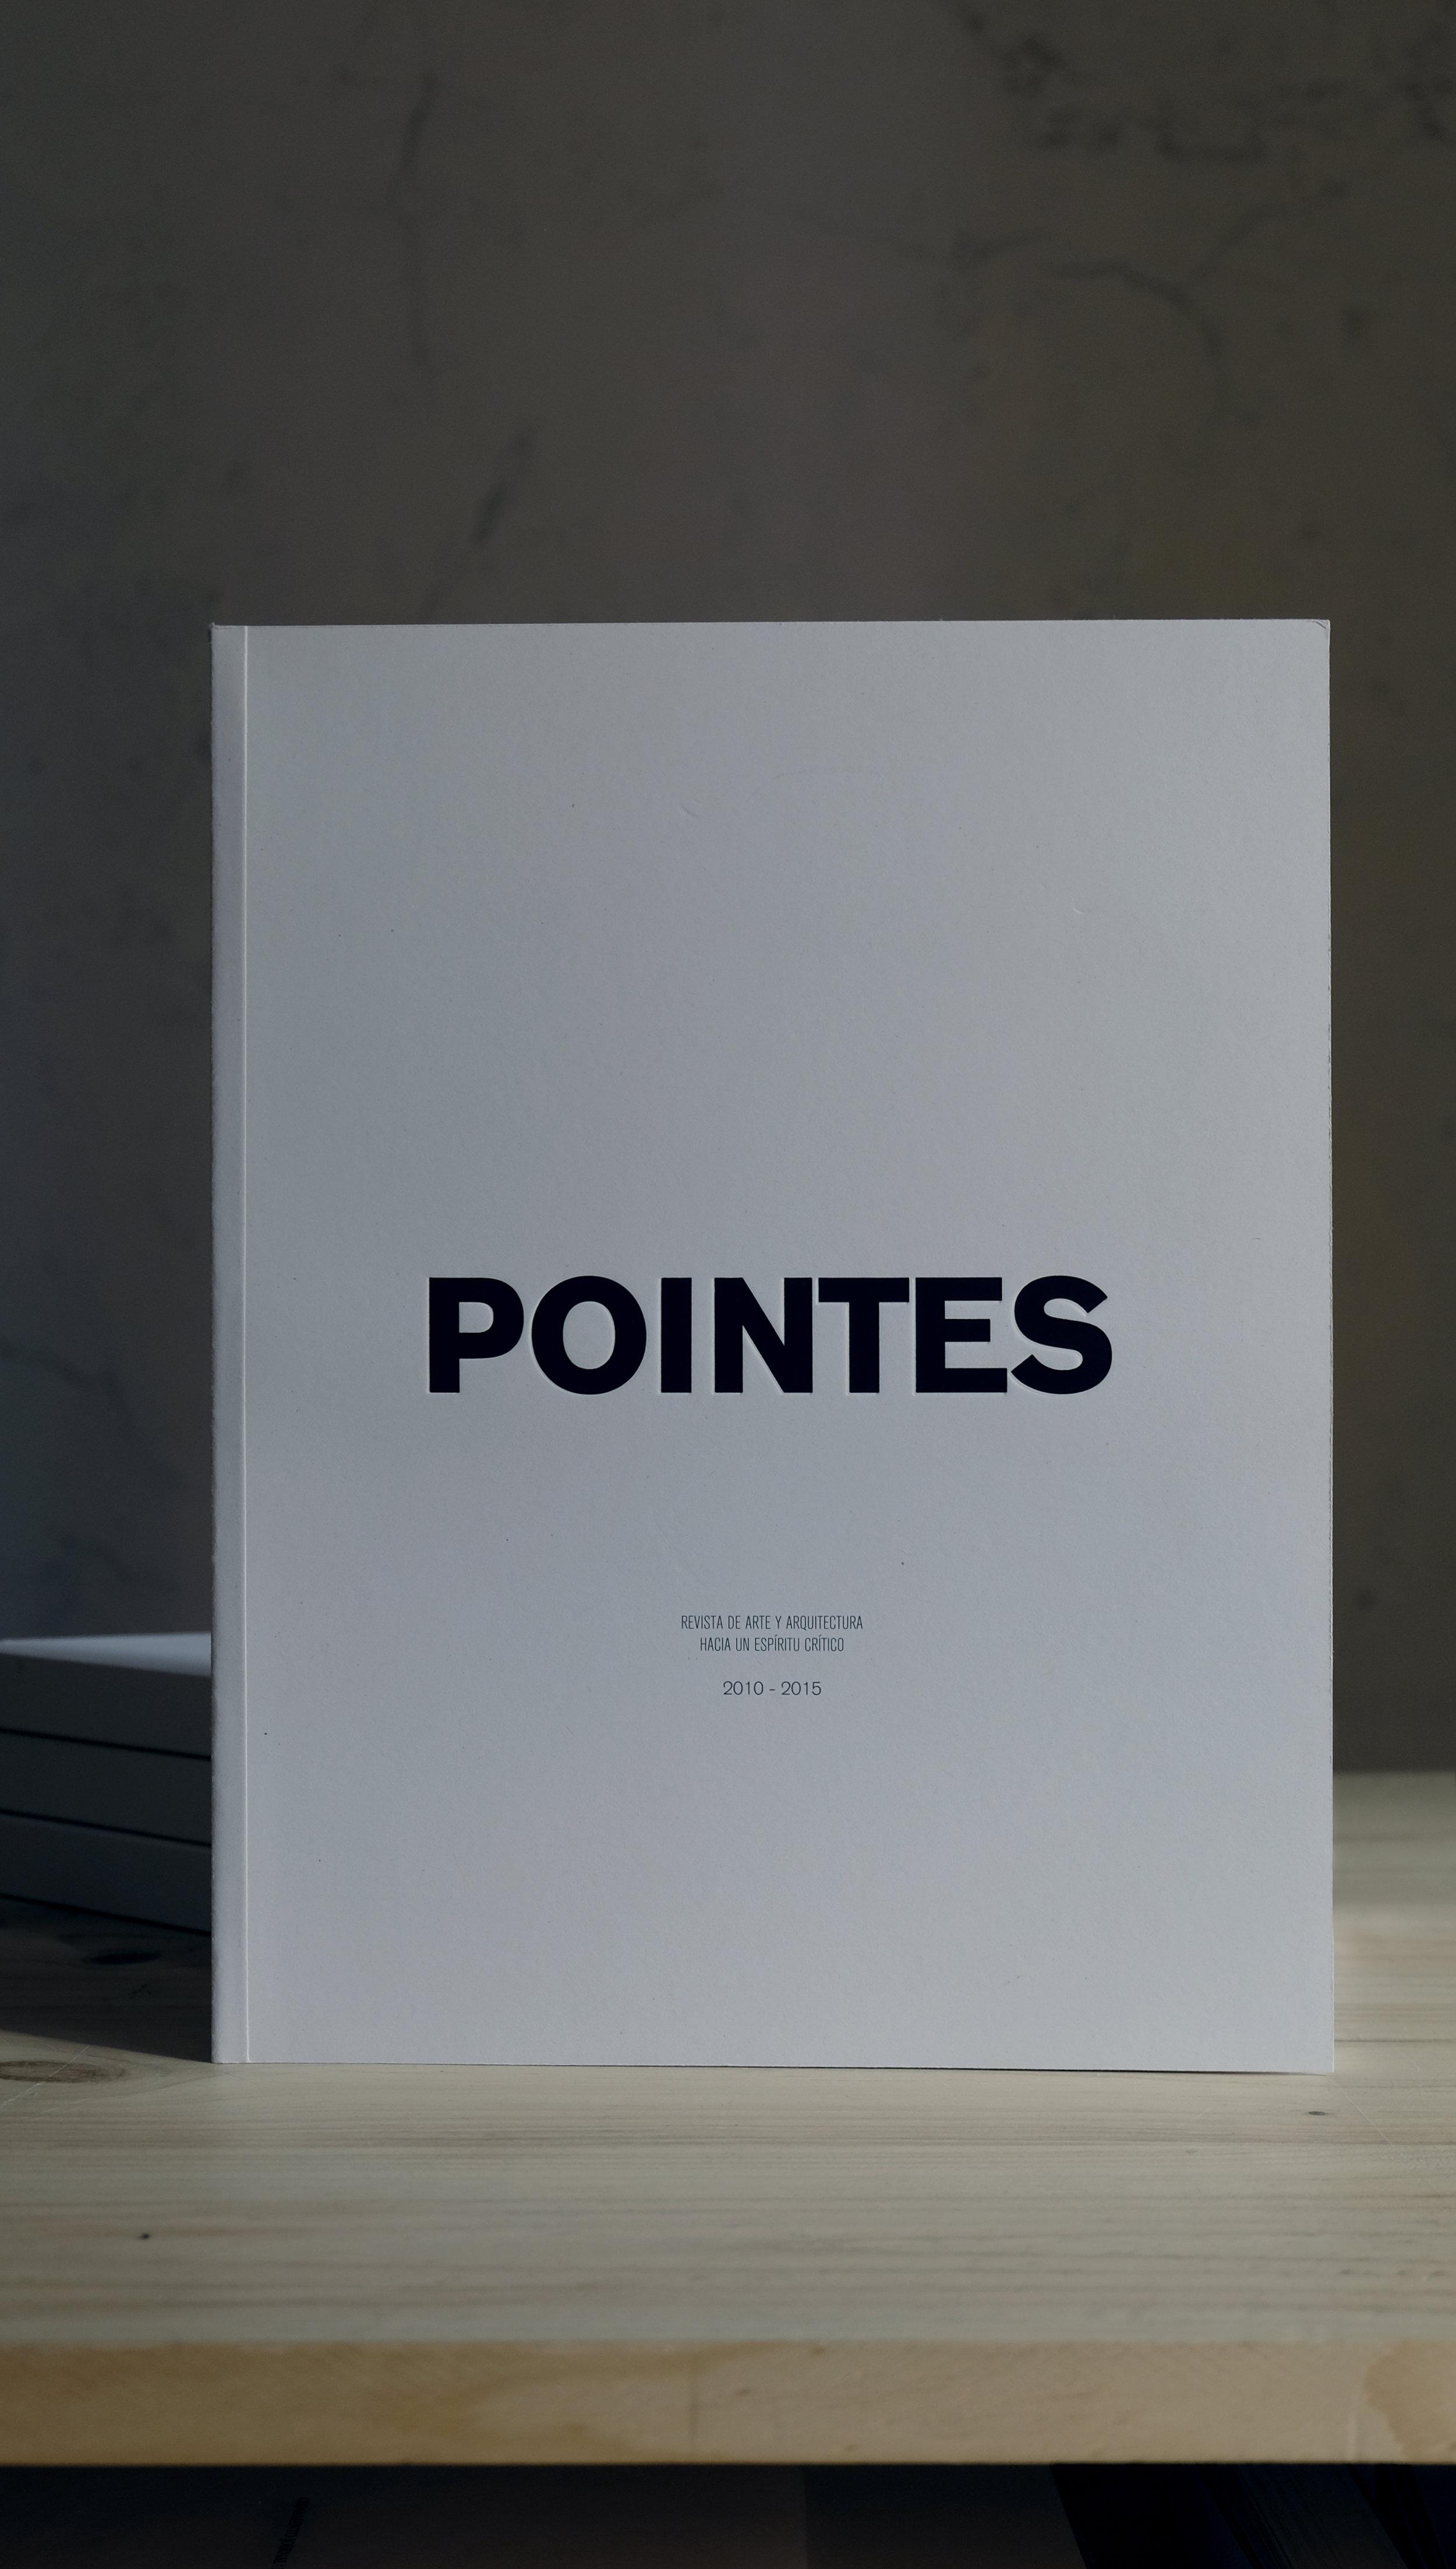 POINTES_1.jpg